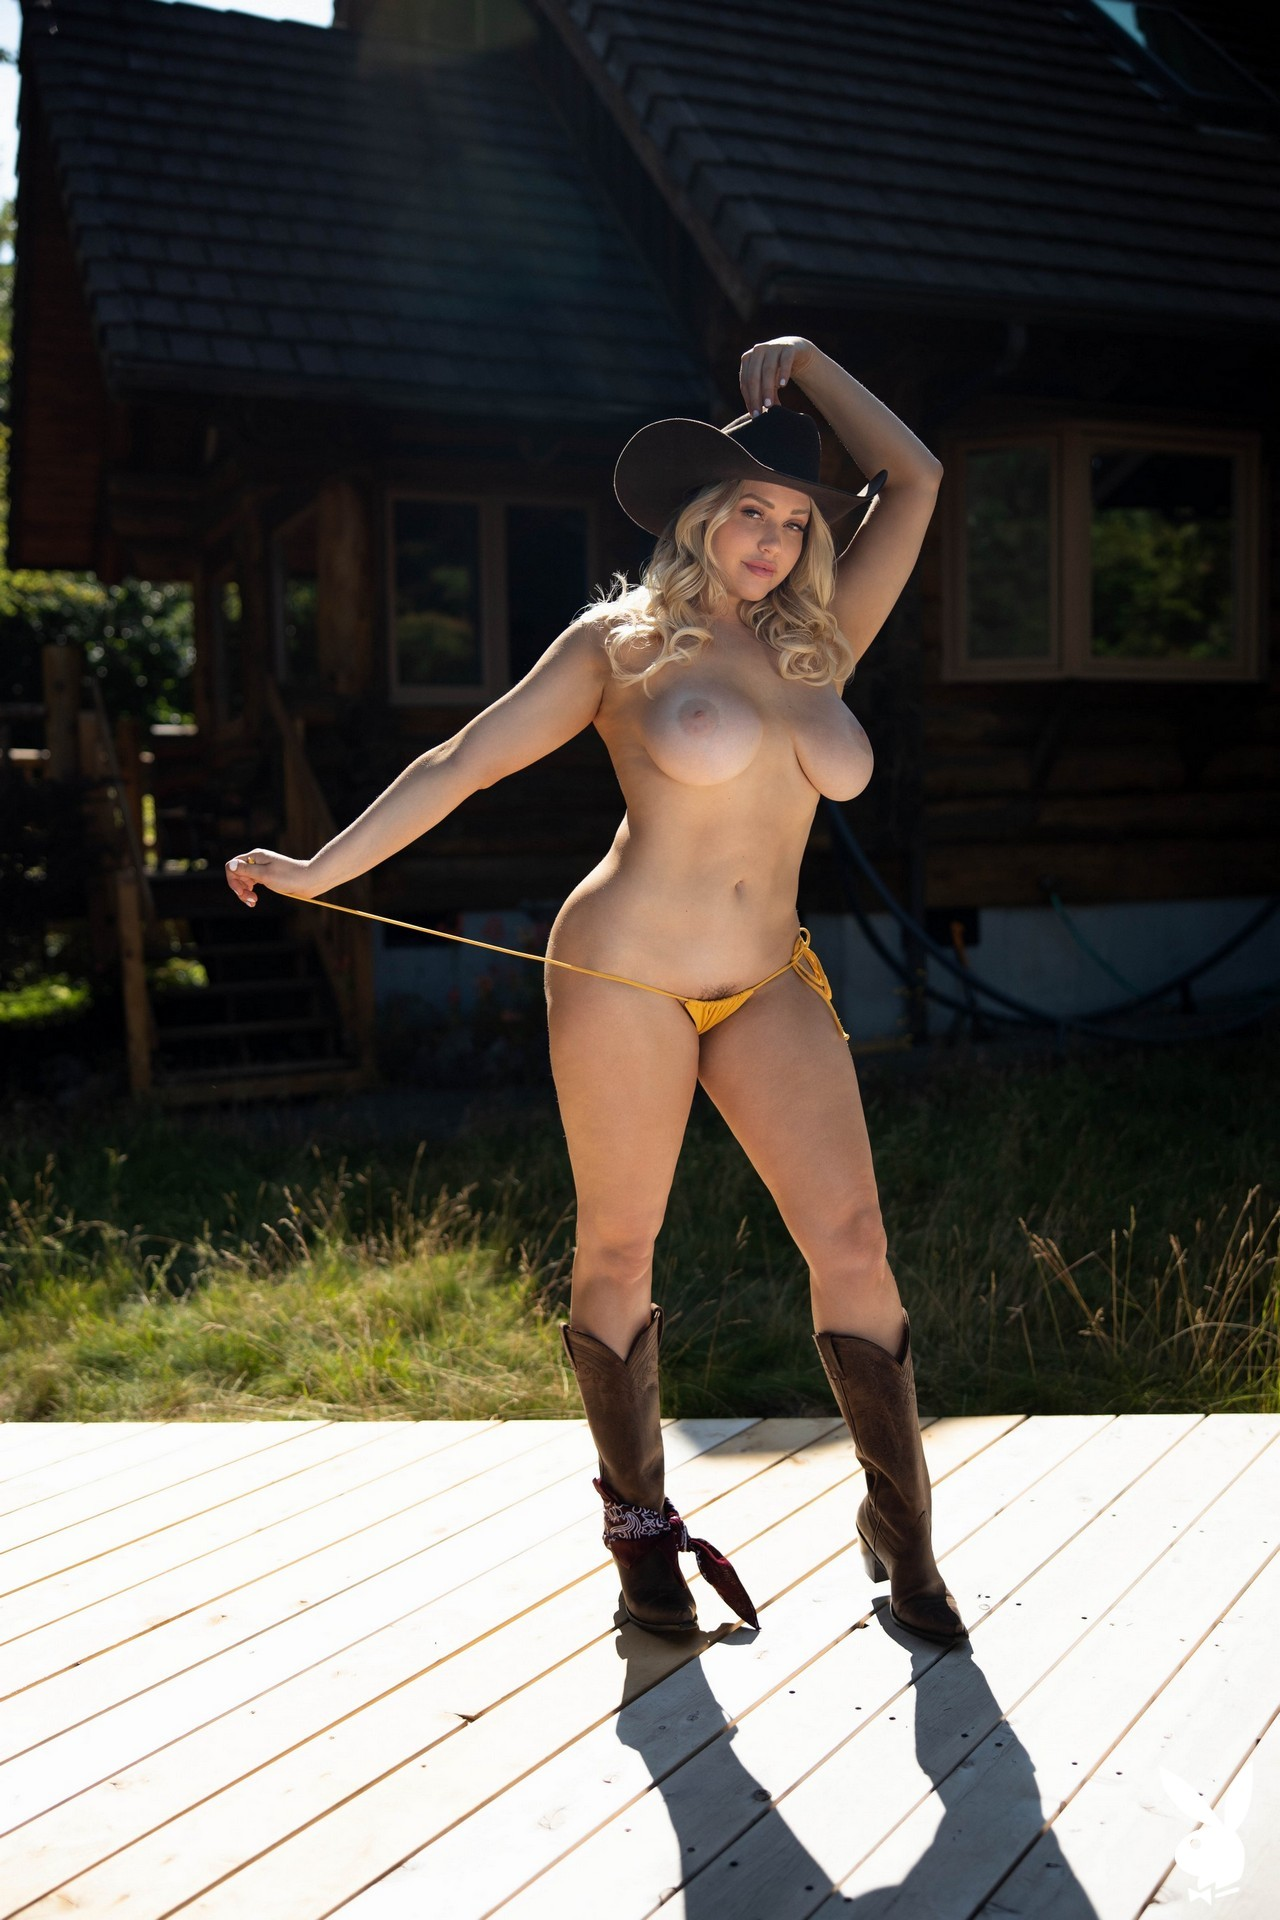 Mia Malkova In Get Your Kicks Playboy Plus (29)